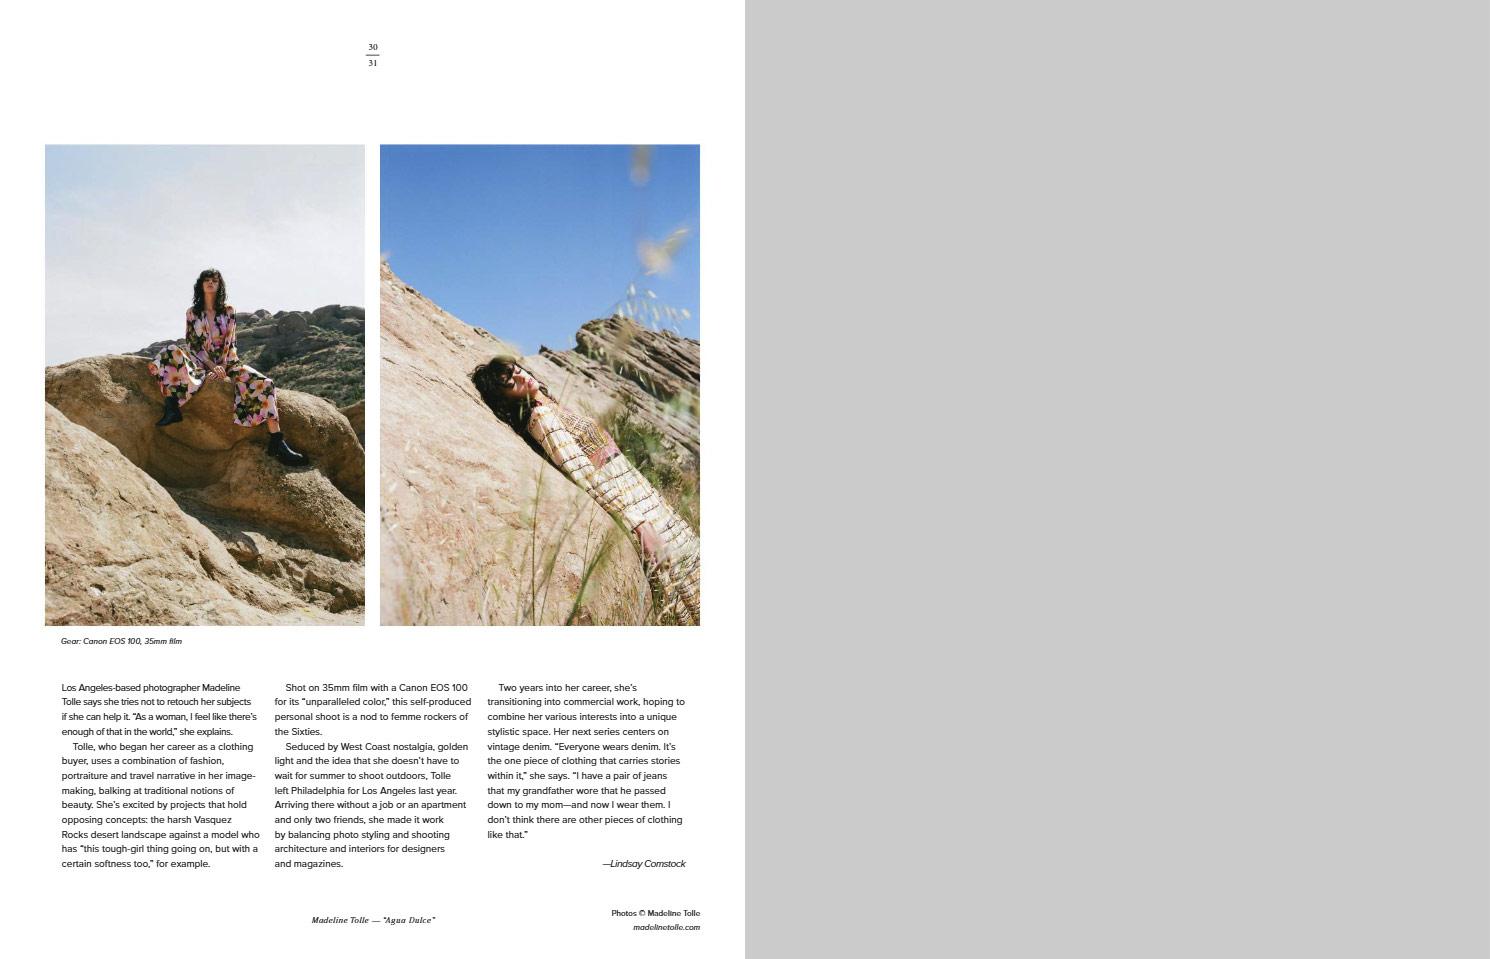 Агуа Дульсе © Мэдлин Толле, Фотоконкурс «Начинающий фотограф» — Emerging Photographer